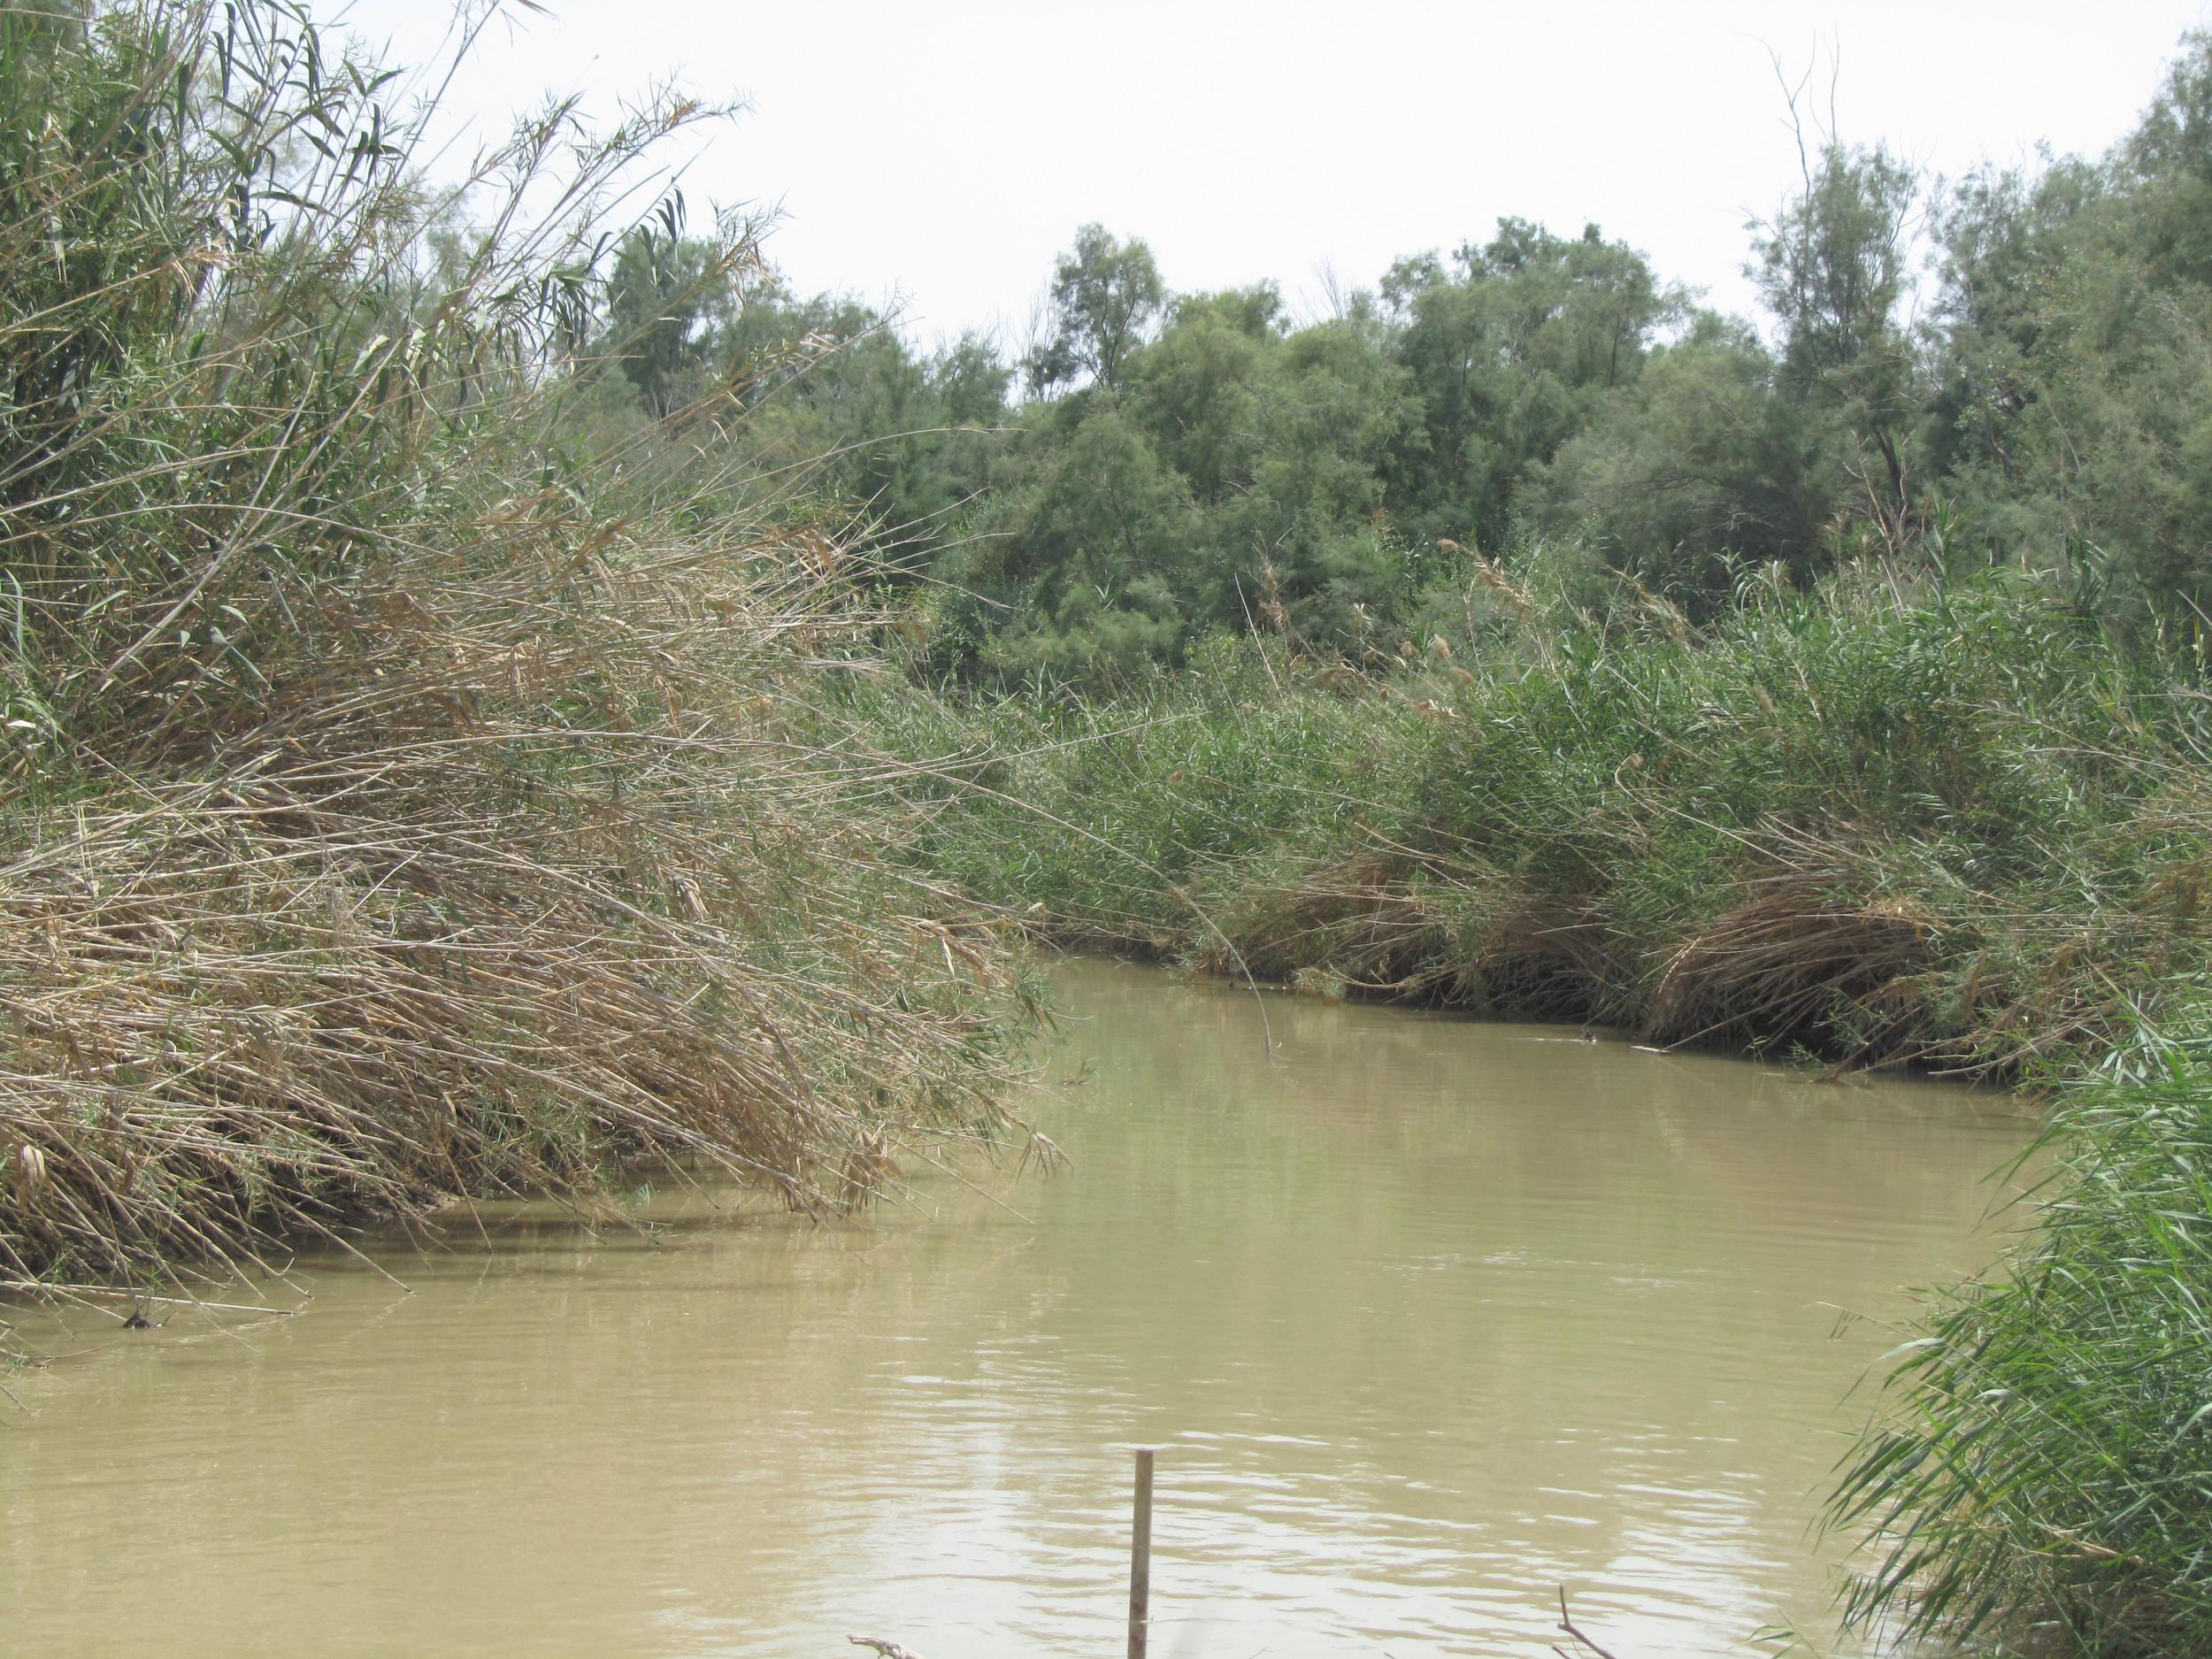 Bethany, Beyond the Jordan, site of Jesus' Baptism